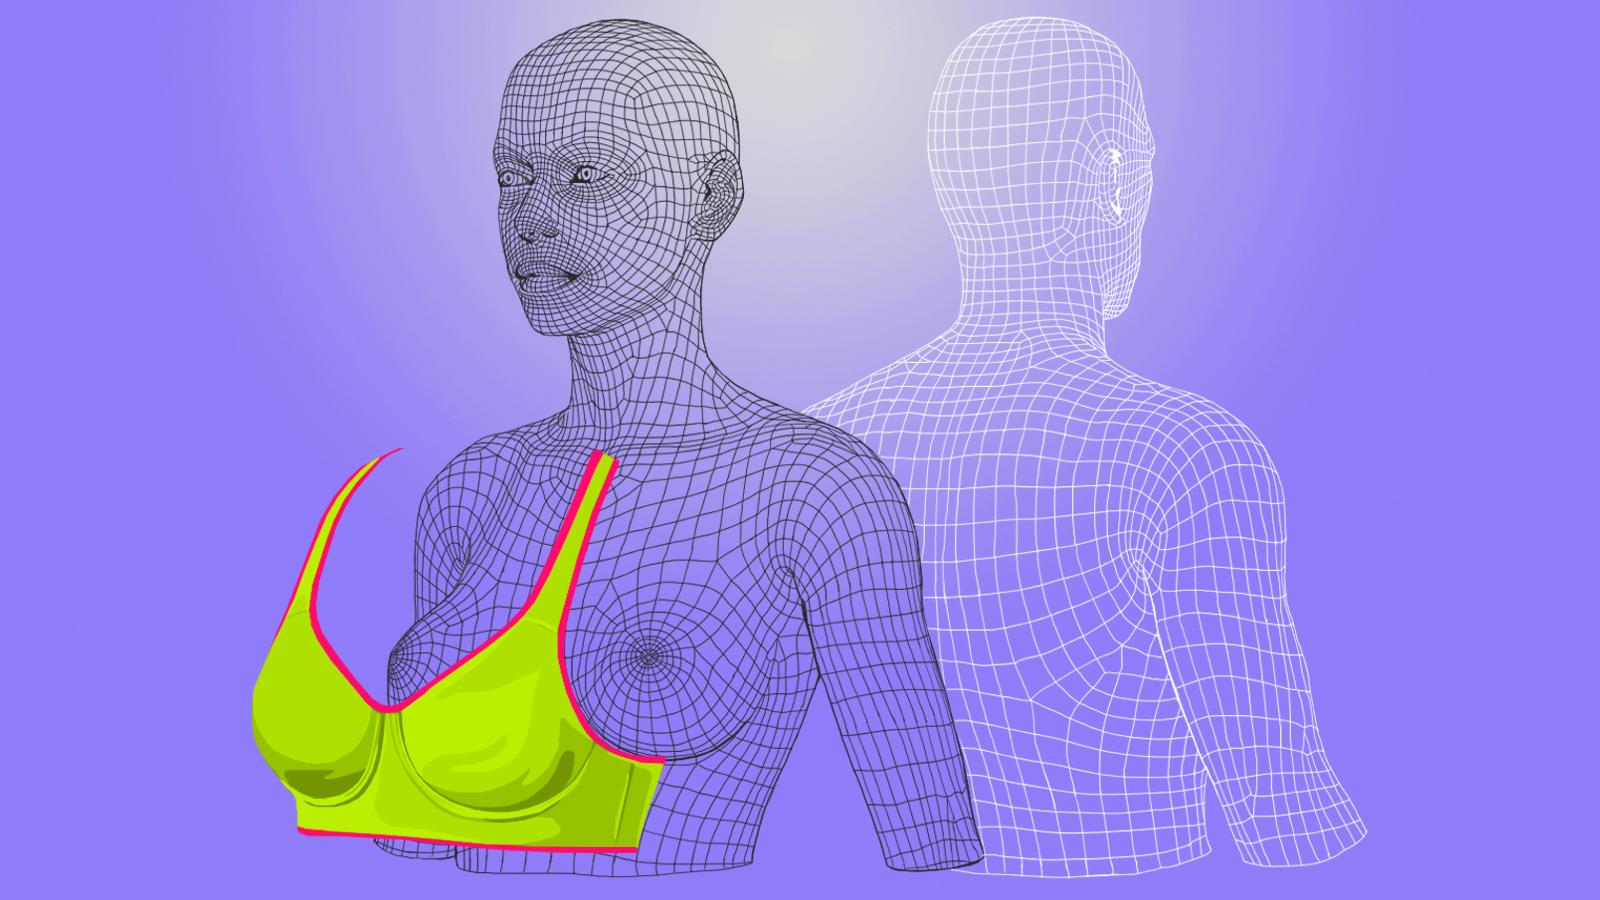 Quartz_body scanning sizes